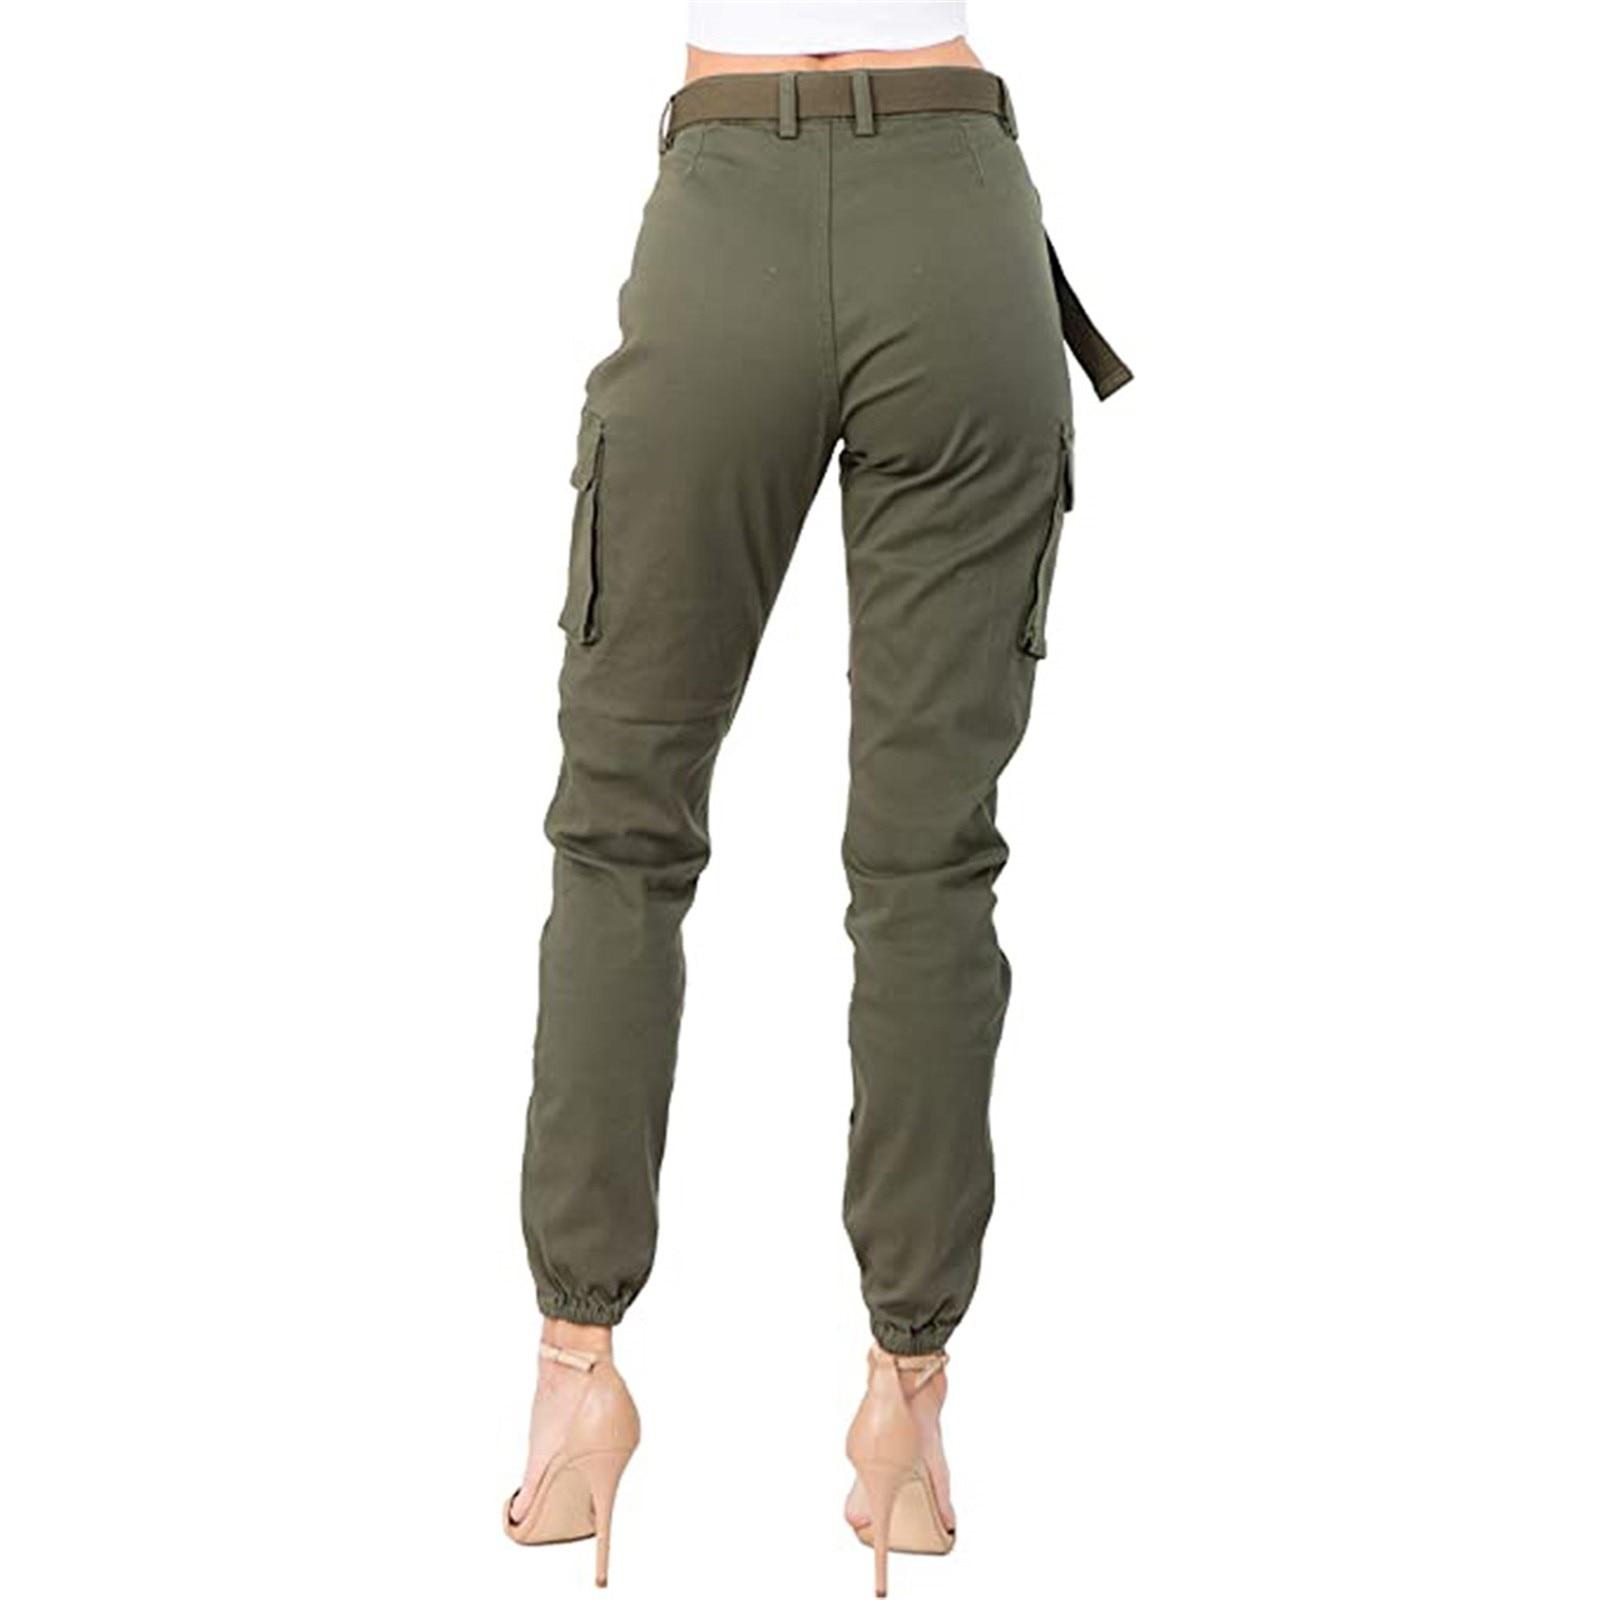 Women High Waist Trousers Slim Fit Slim Pants Autumn Sexy Female Women's Fashion Casual Joggers Elastic Pants Femme Pant QE